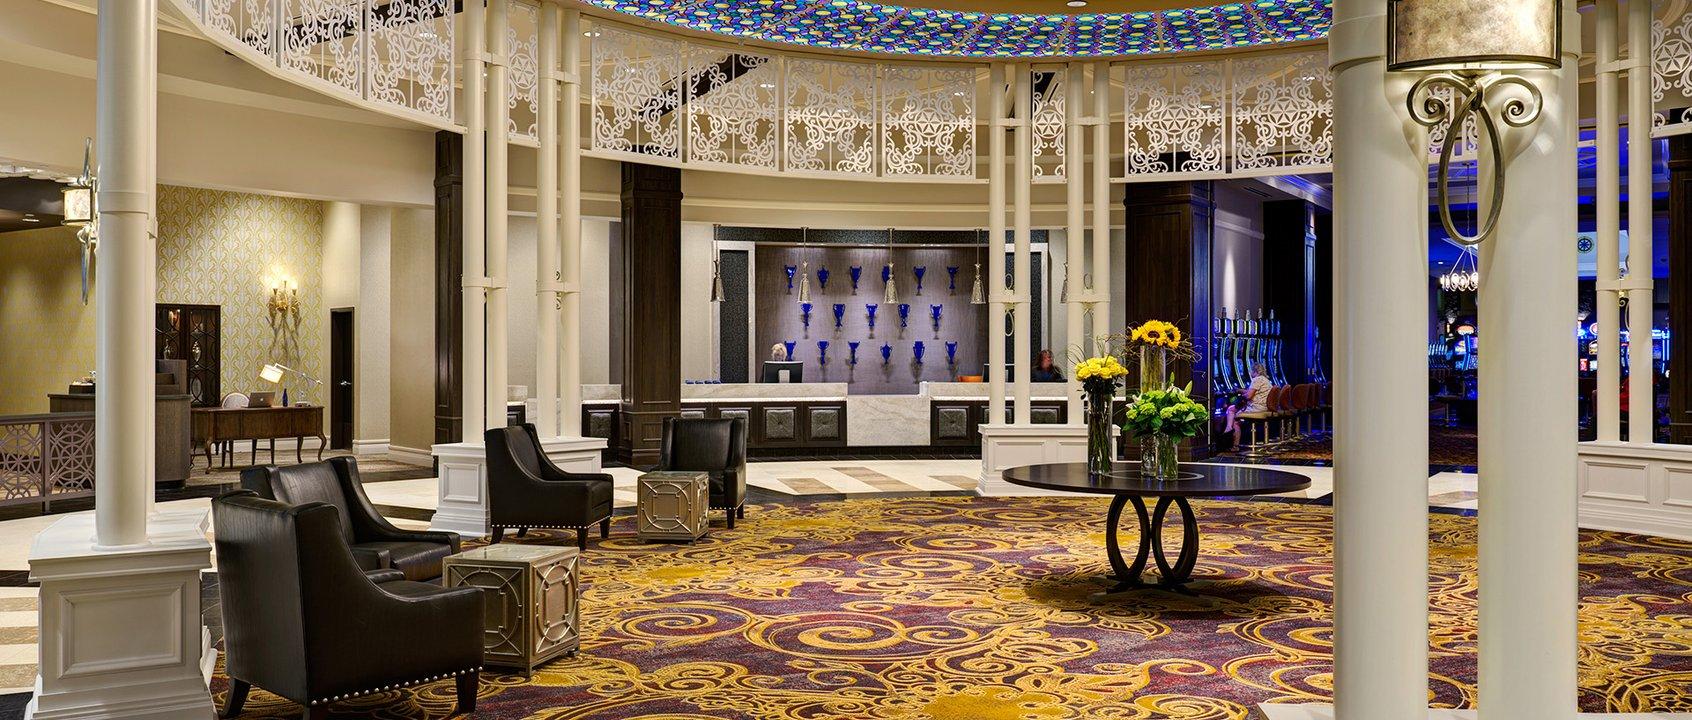 Saratoga Hotel Jcj Architecture